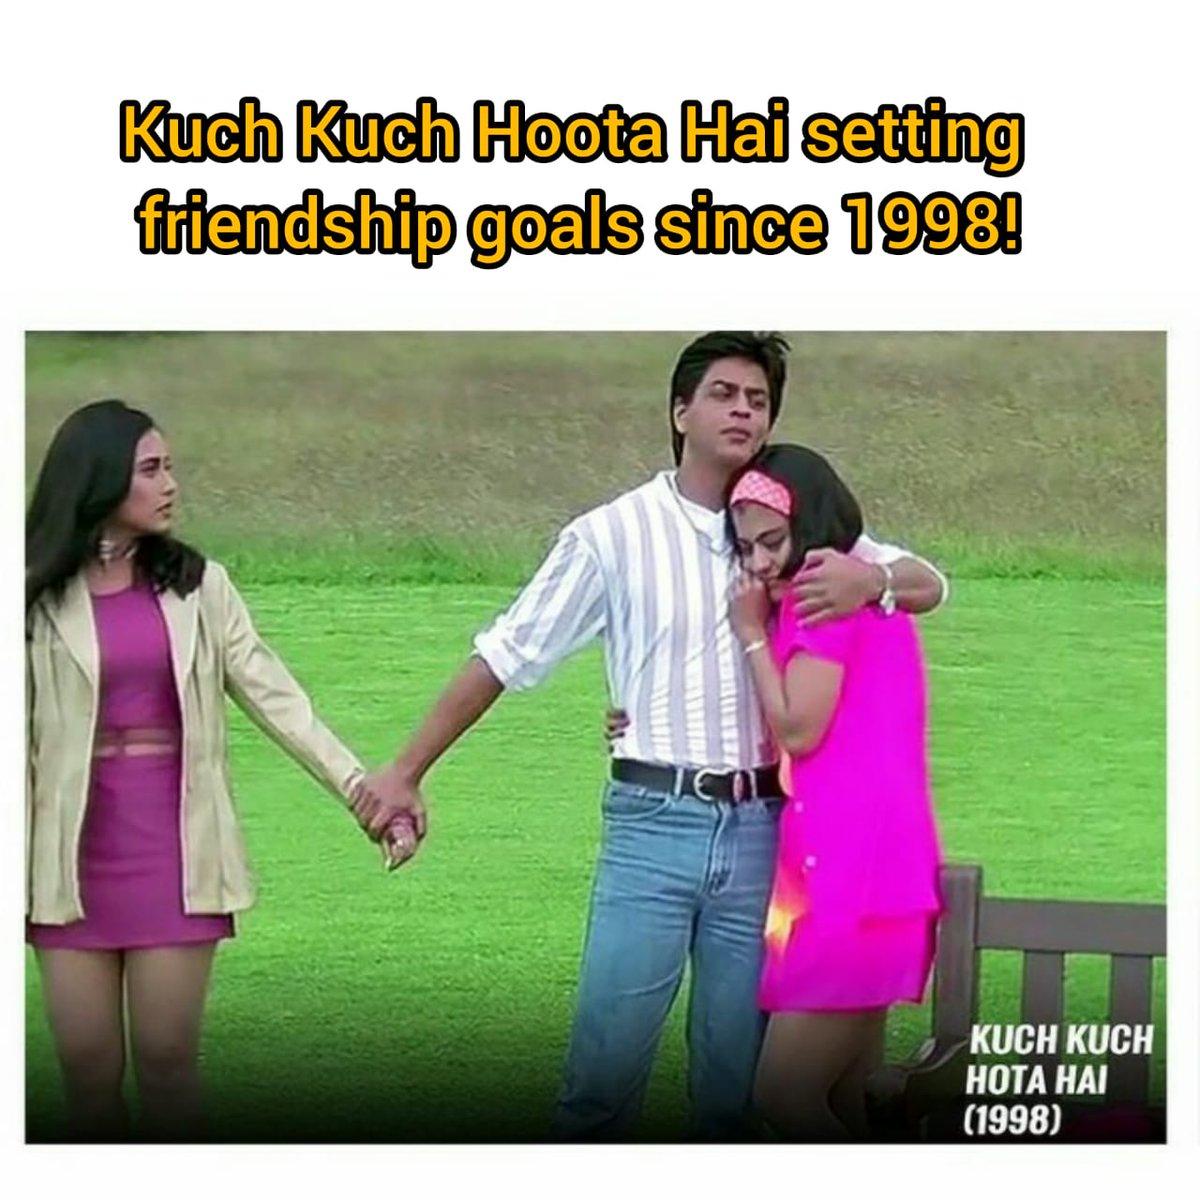 Kuch kuch hota hai since 1998!🤪 #KaranJohar #DharmaProductions #Bollywood #KuchKuchHotaHai #BestMovies #BollywoodMovies #Entertainment #BestFilmMaker #BestDirector #BestMovie #Director https://t.co/nSqWNdDeTN